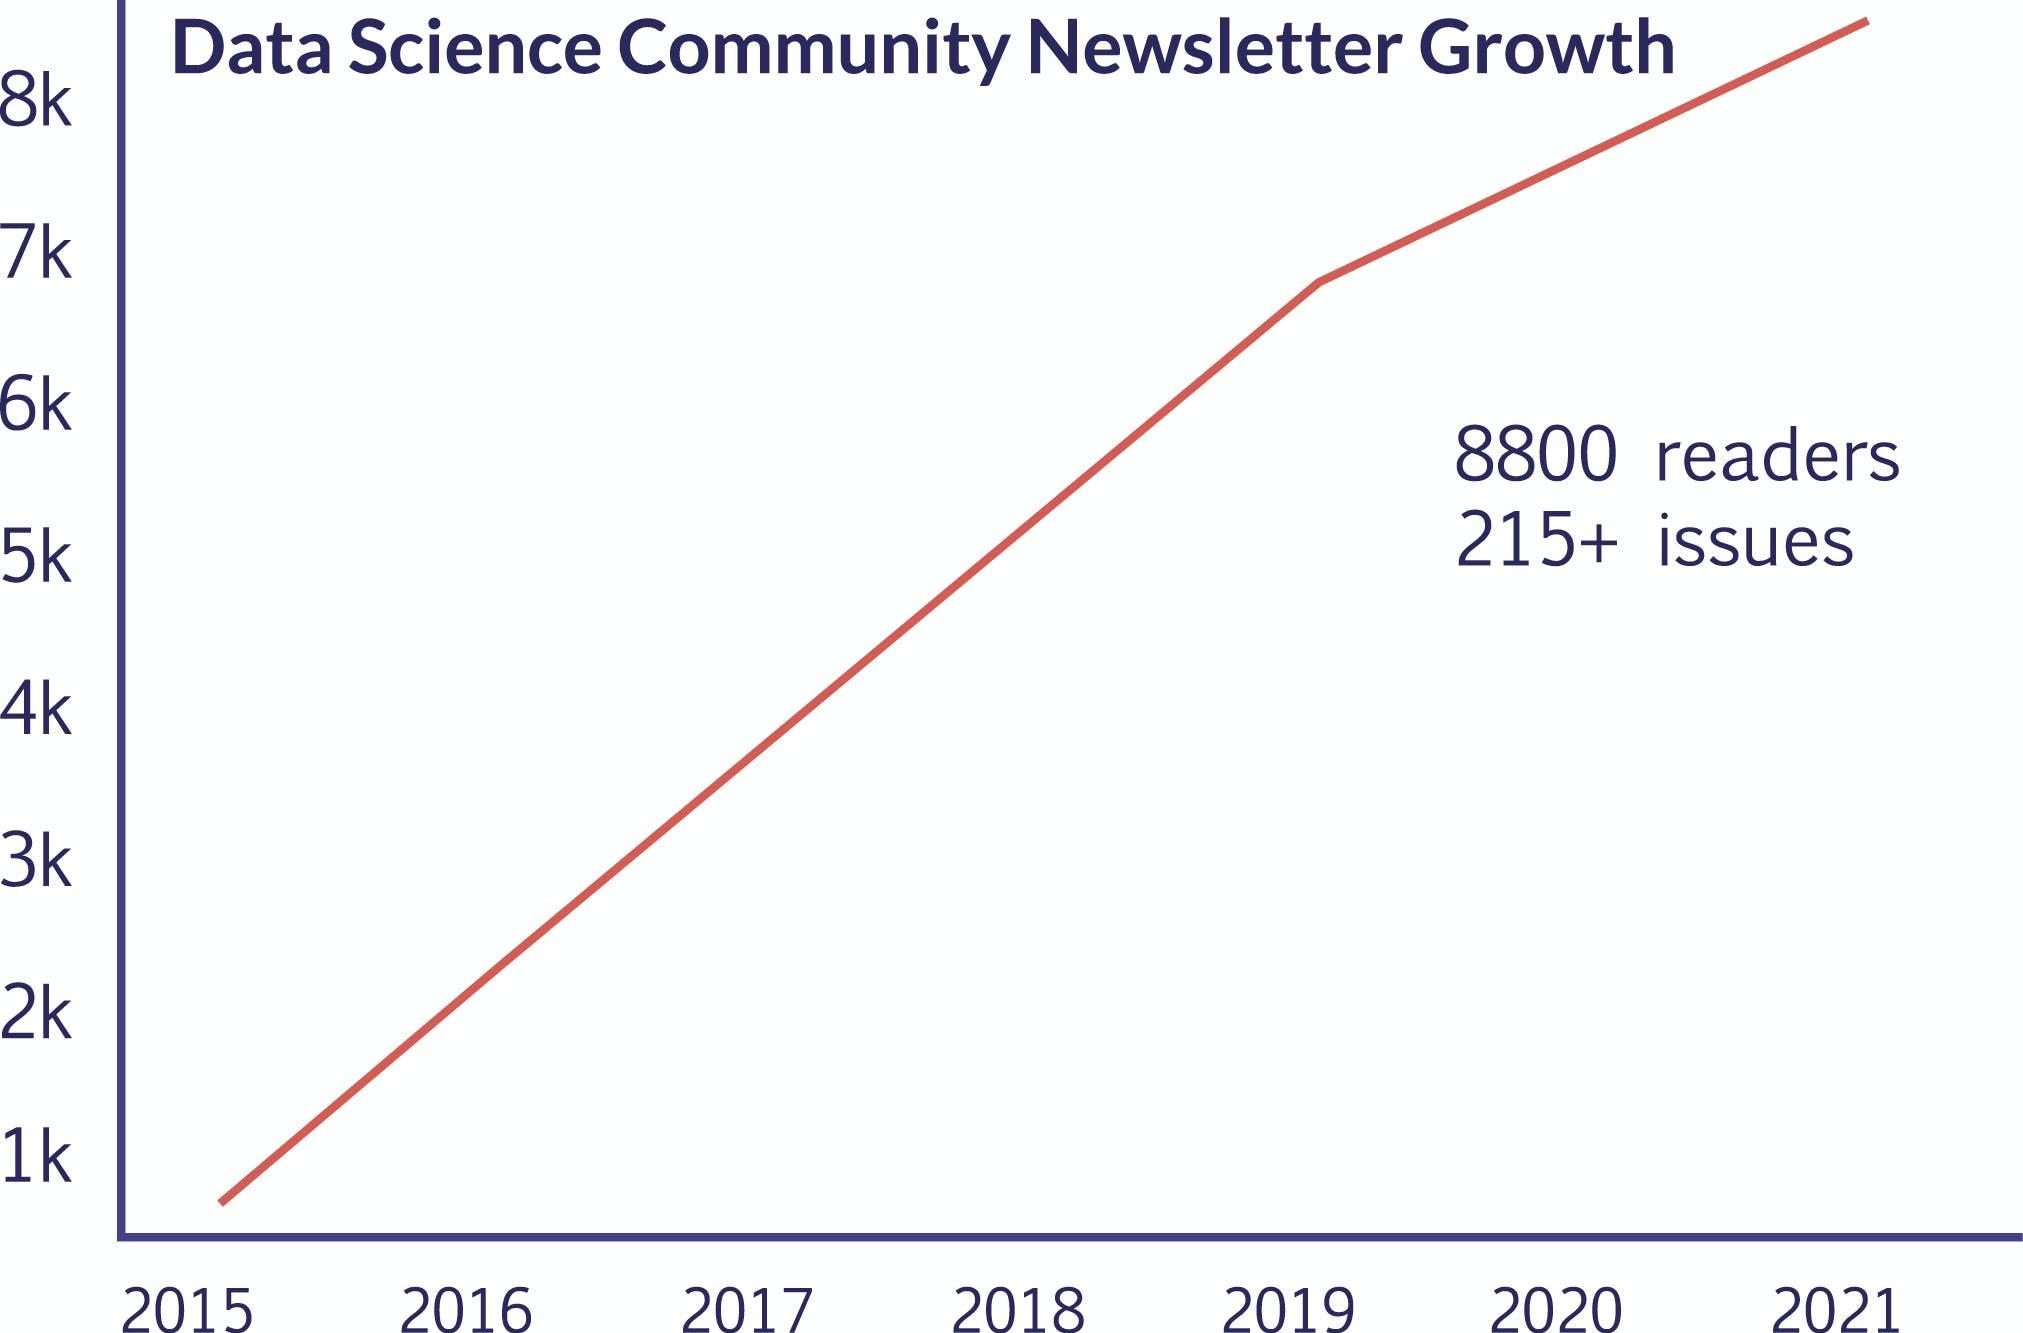 chart showing DSCN readership over time